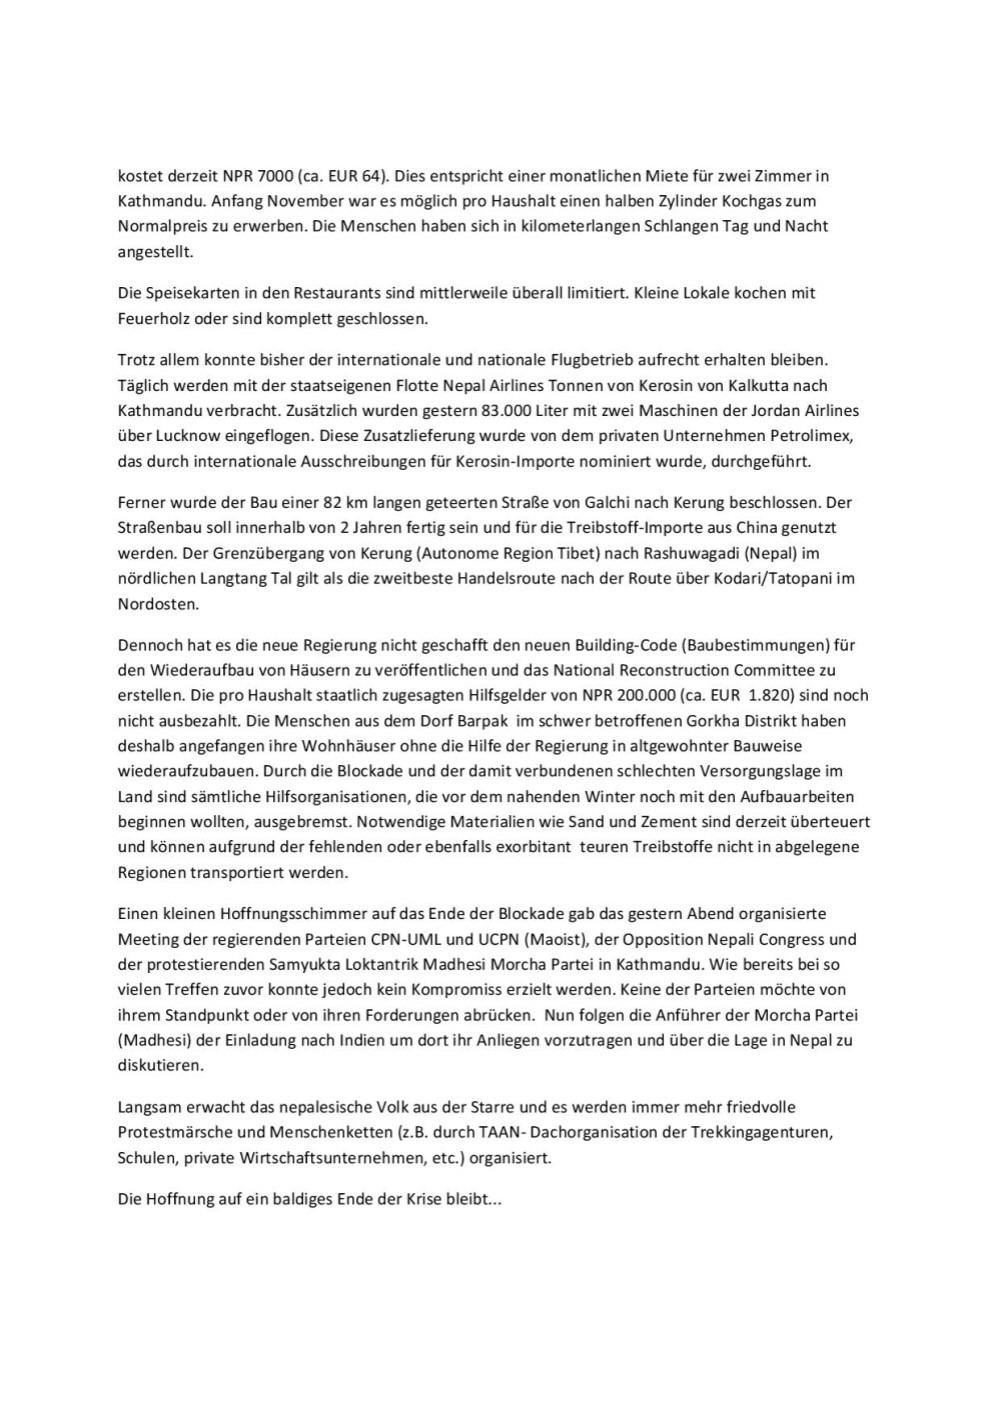 NEPAL_Lagebericht_06122015-002(1)